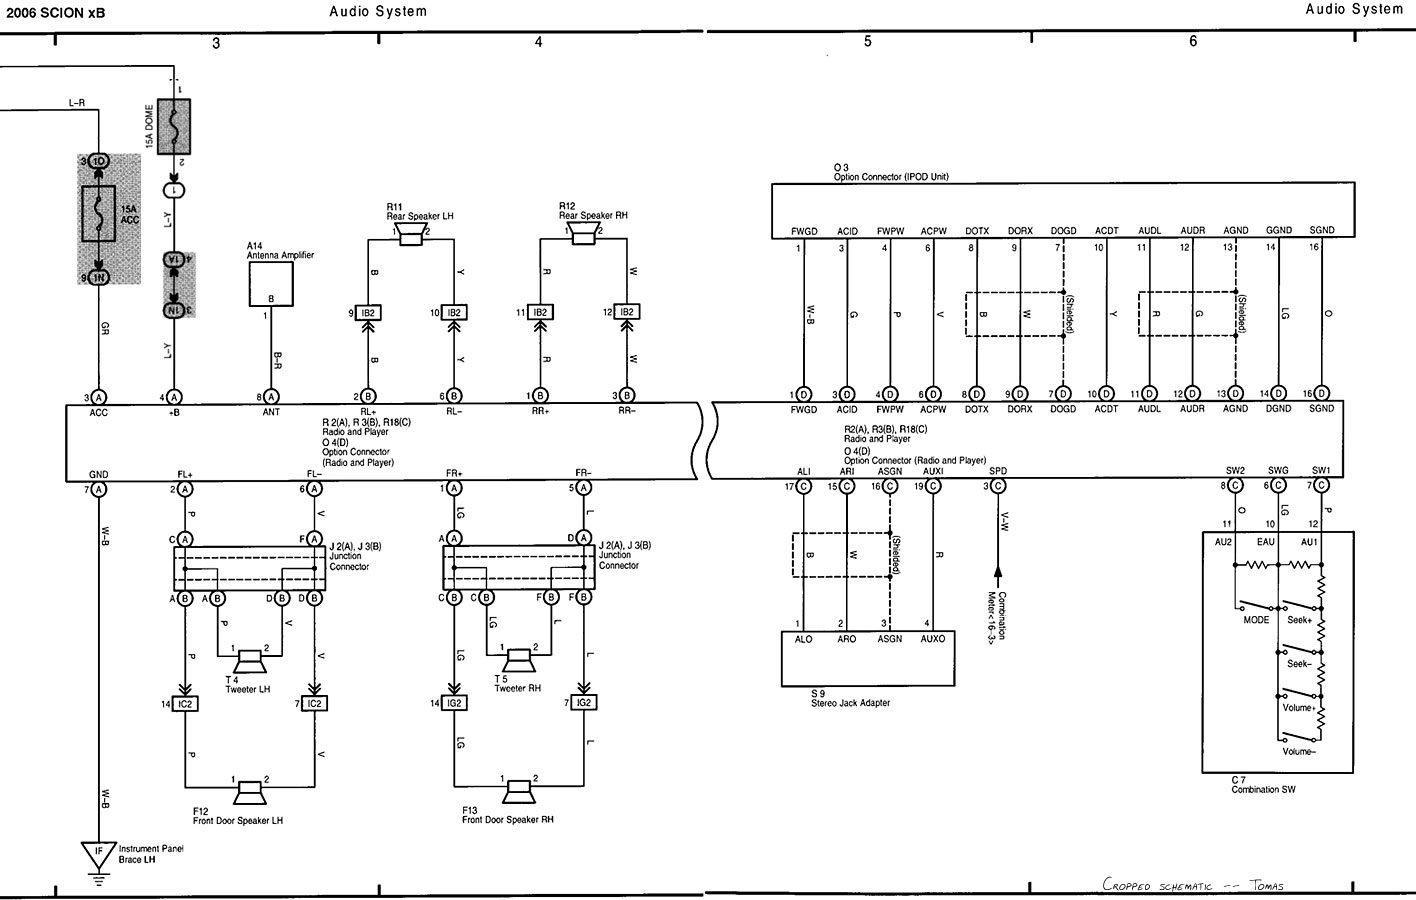 amphicar wiring diagram   23 wiring diagram images